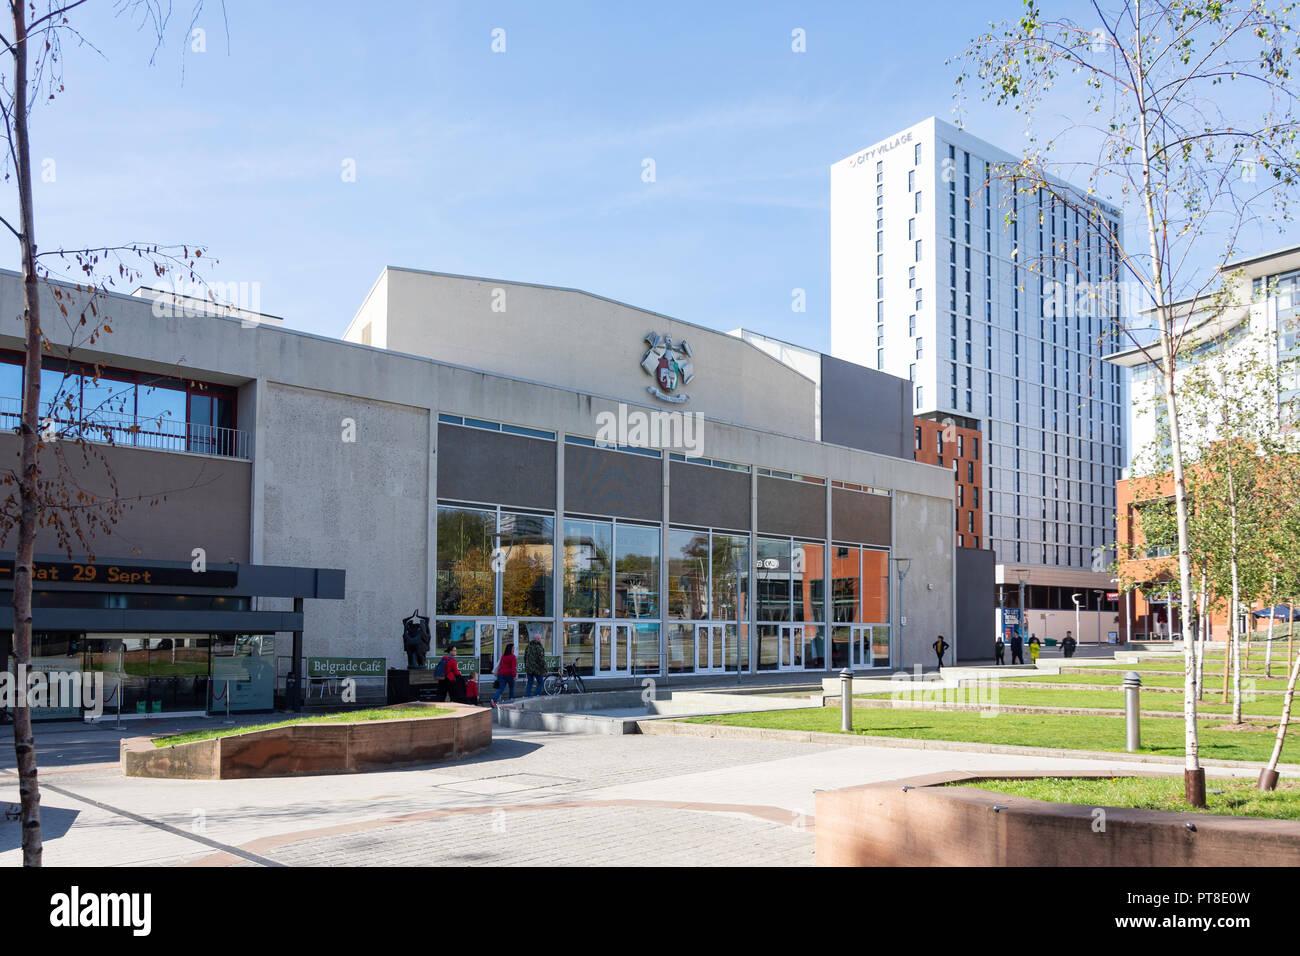 Belgrade Theatre, Belgrade Square, Coventry, West Midlands, England, United Kingdom - Stock Image